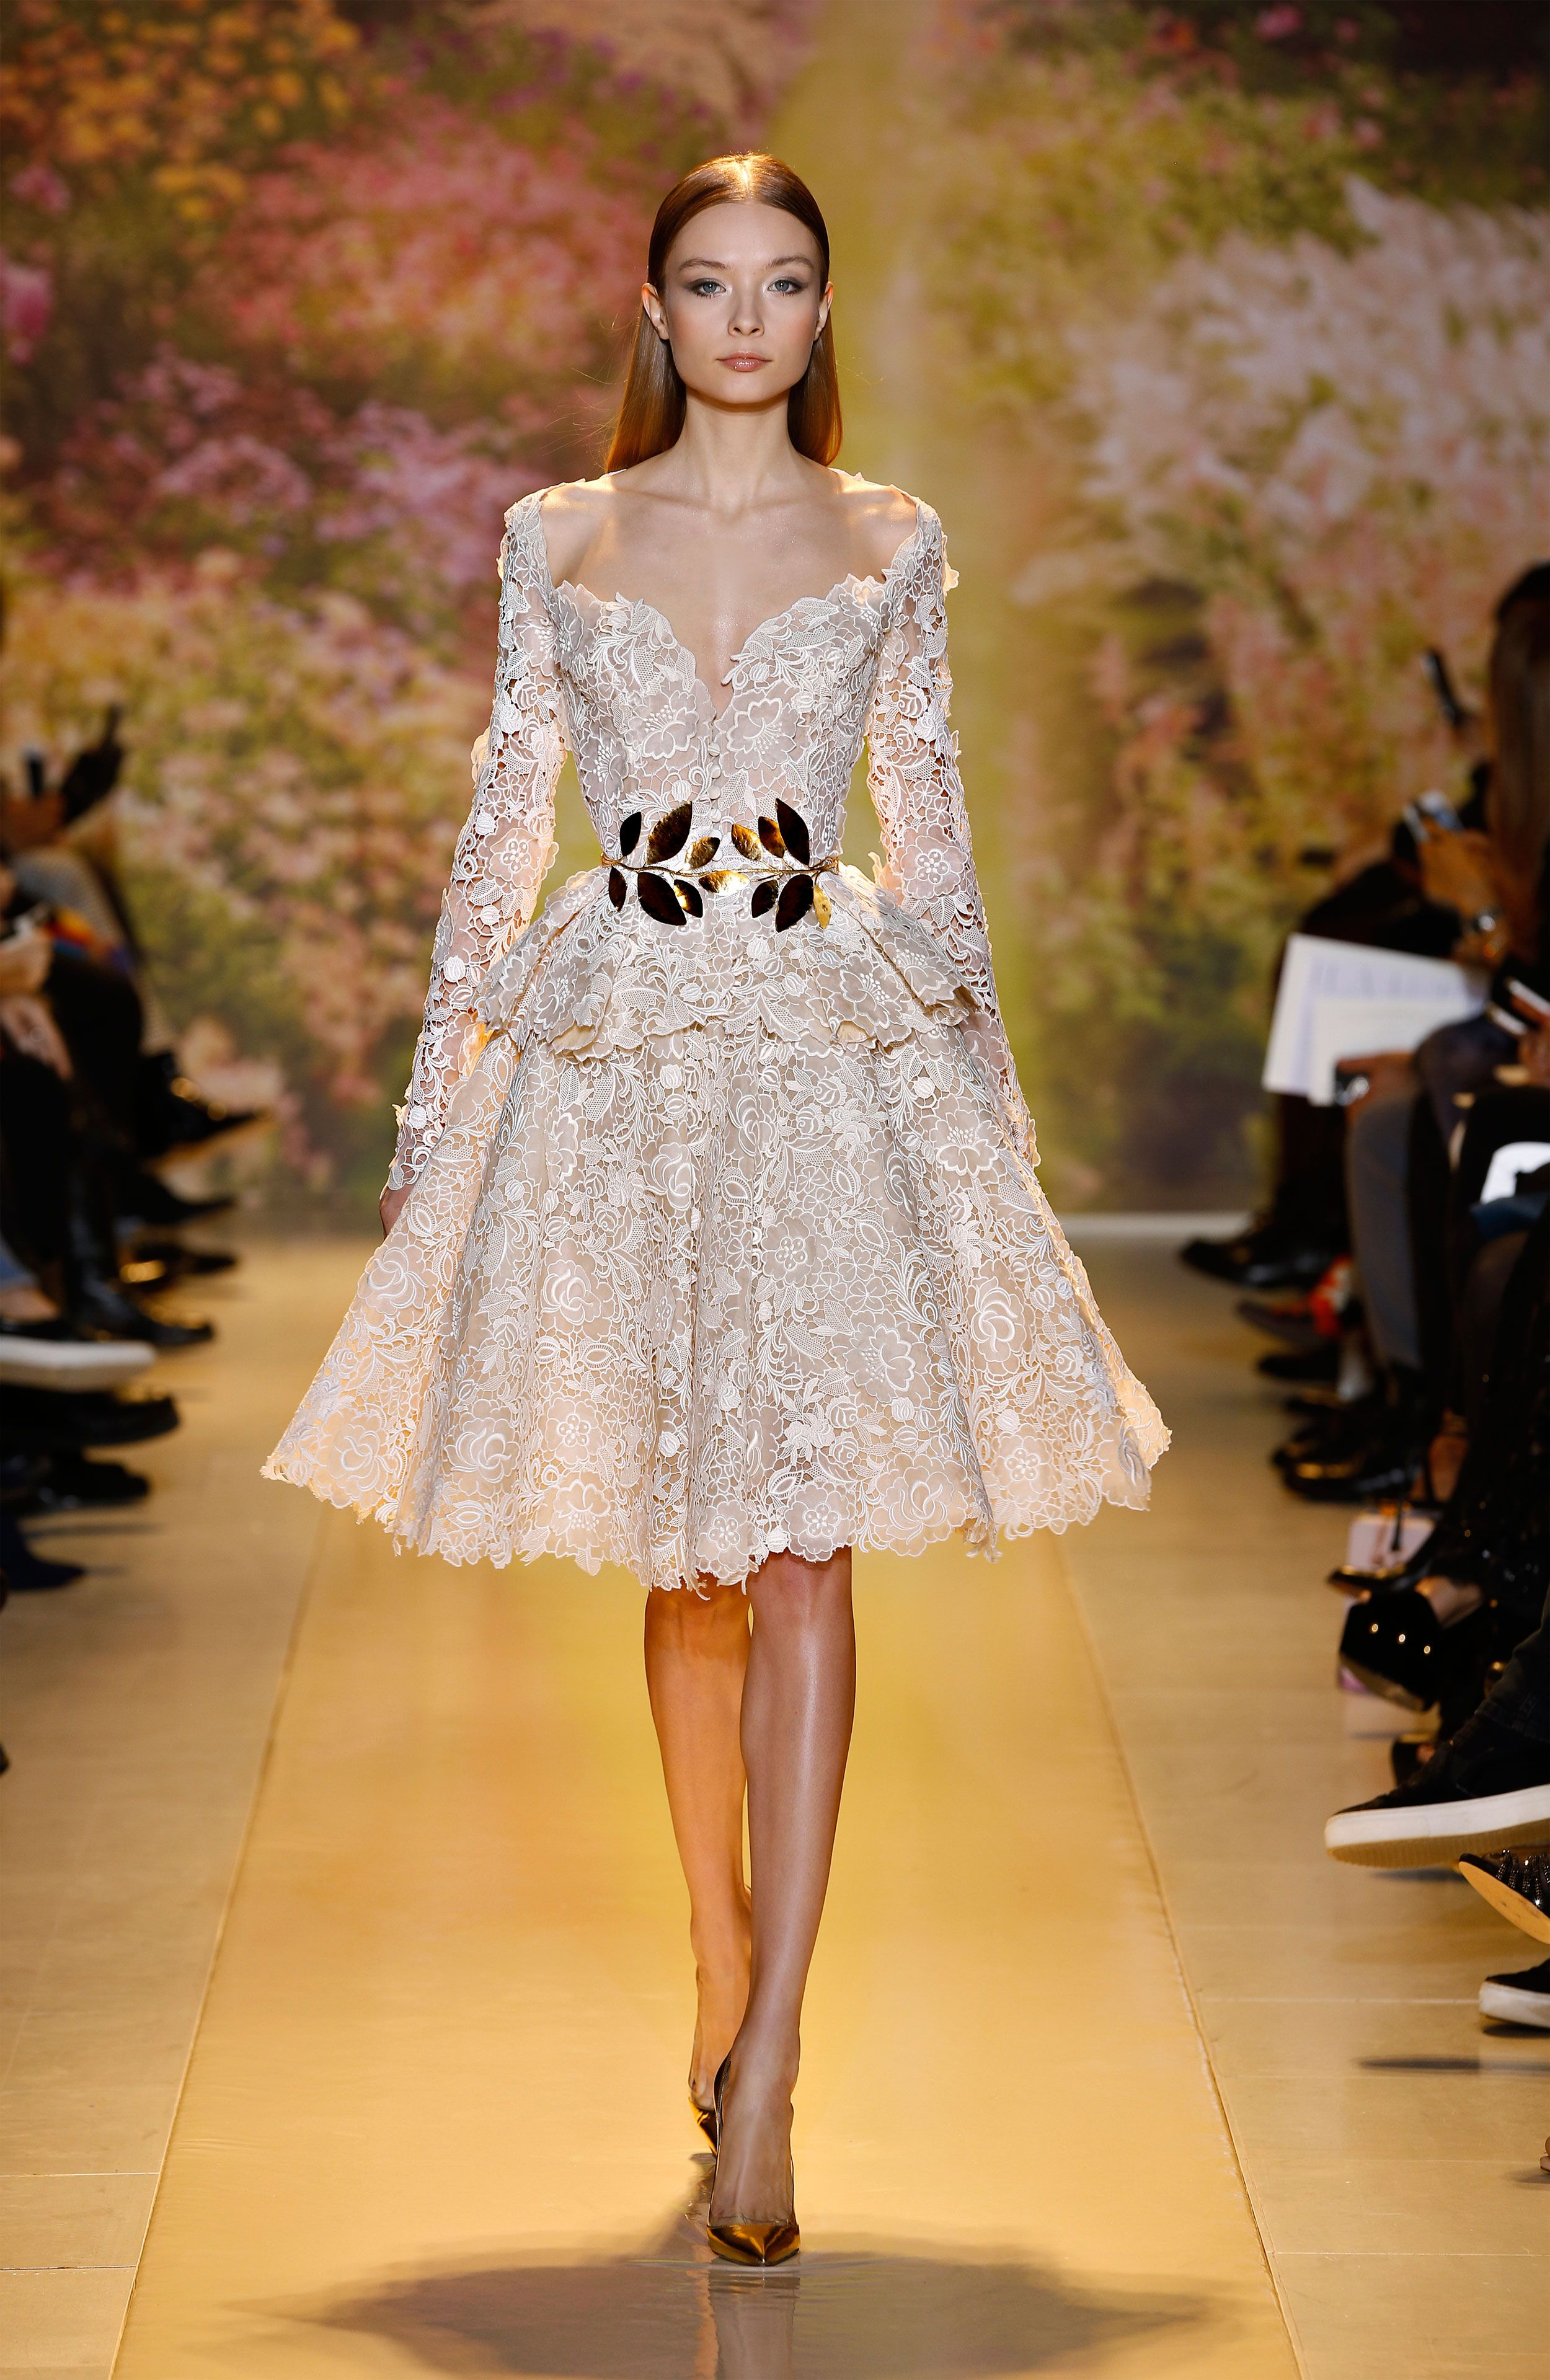 Noir Lemon Floral Dress   Dressy fashion, Dresses, Fashion